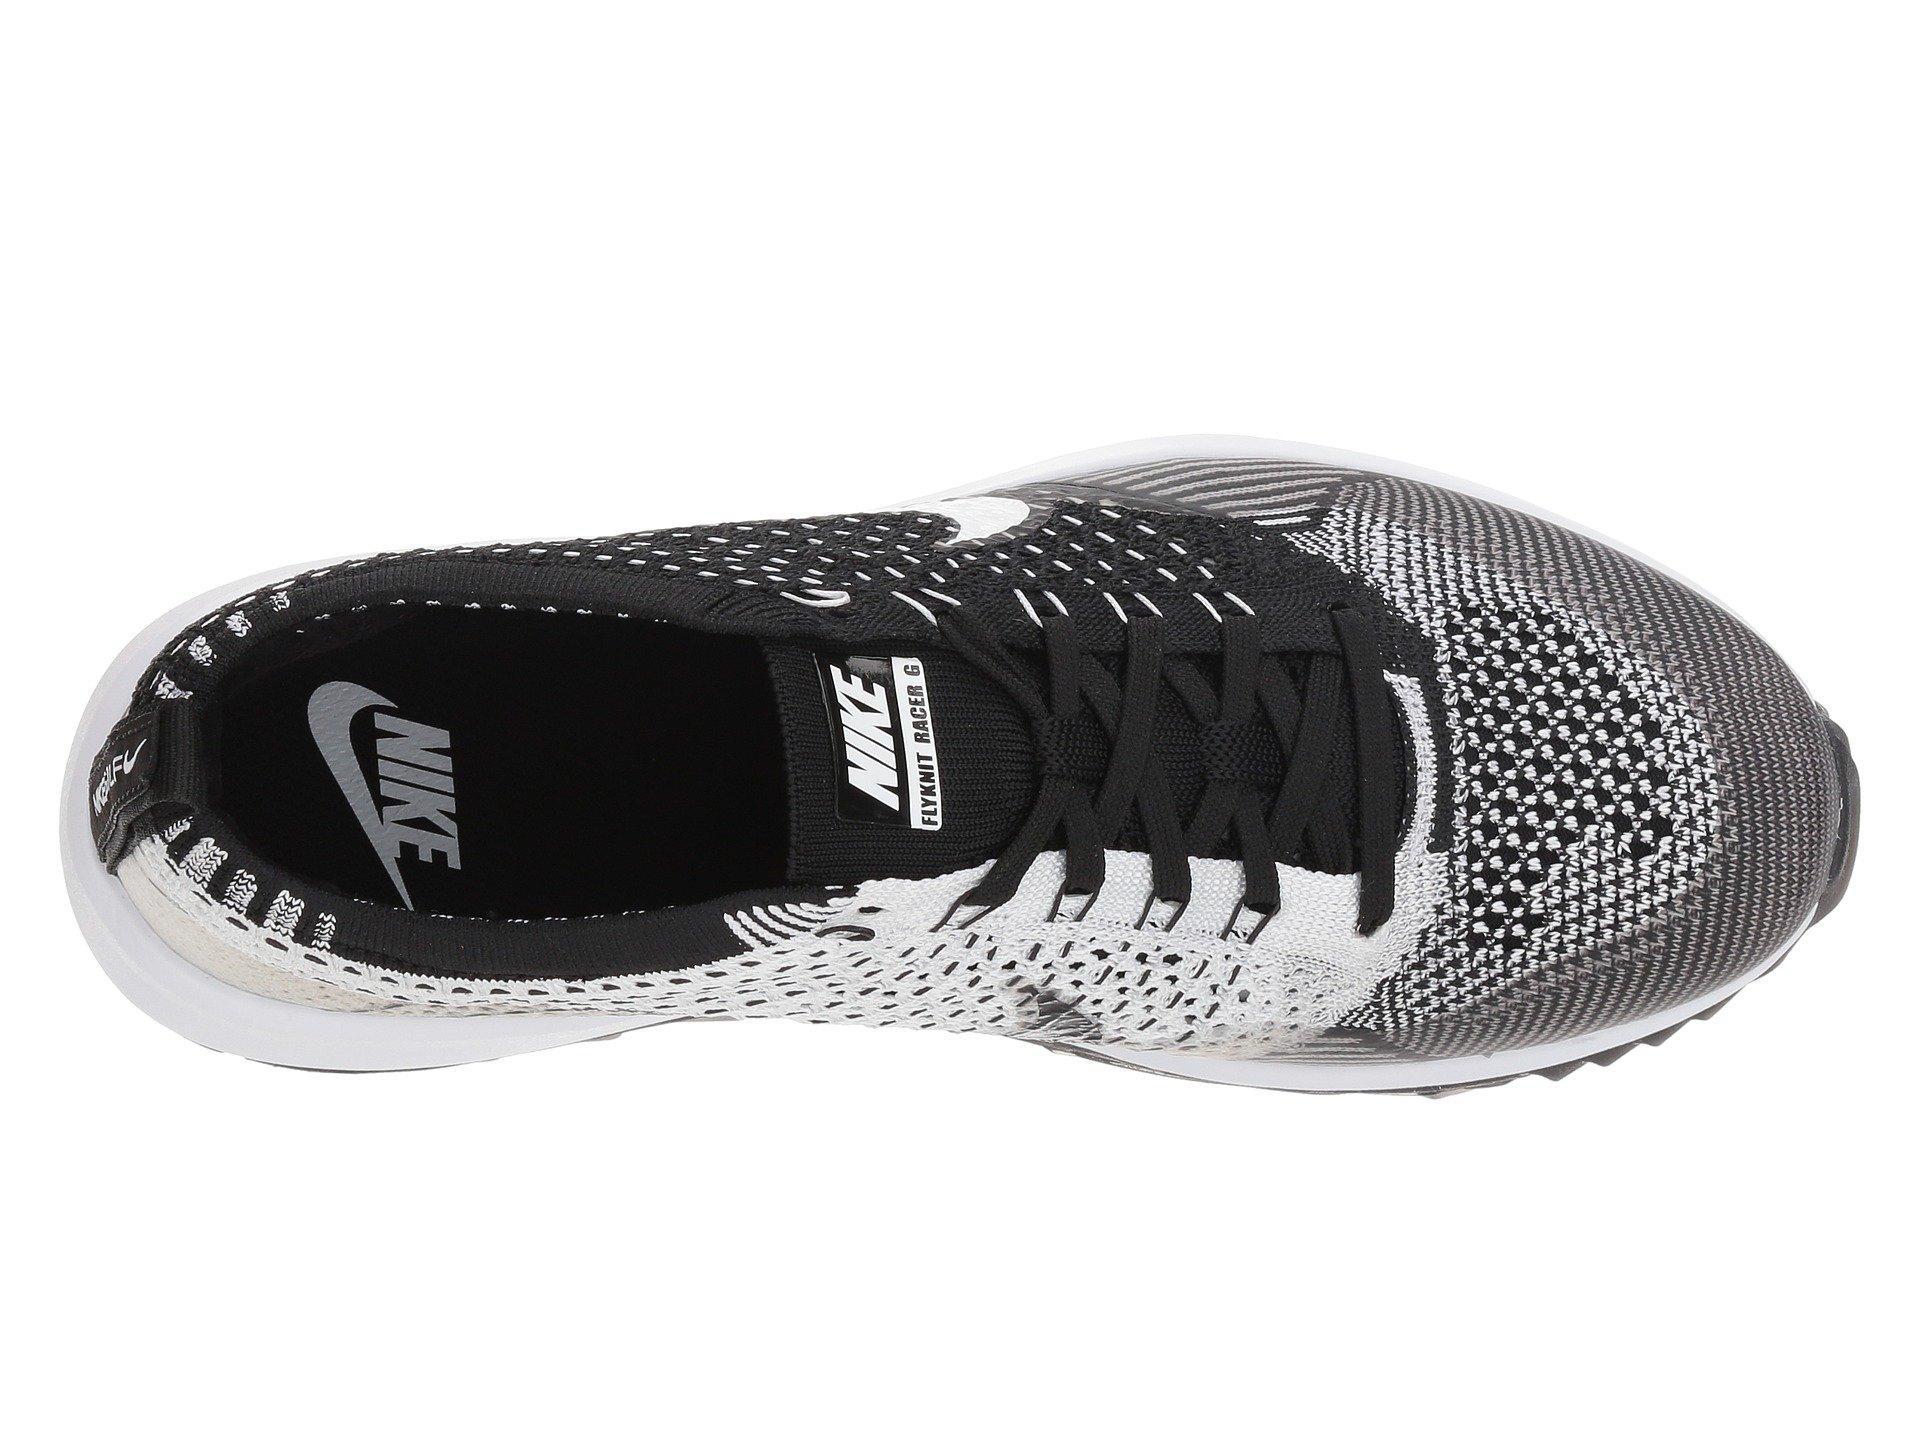 wholesale dealer 8d0ee 36e93 Nike - Black Flyknit Racer G - Lyst. View fullscreen